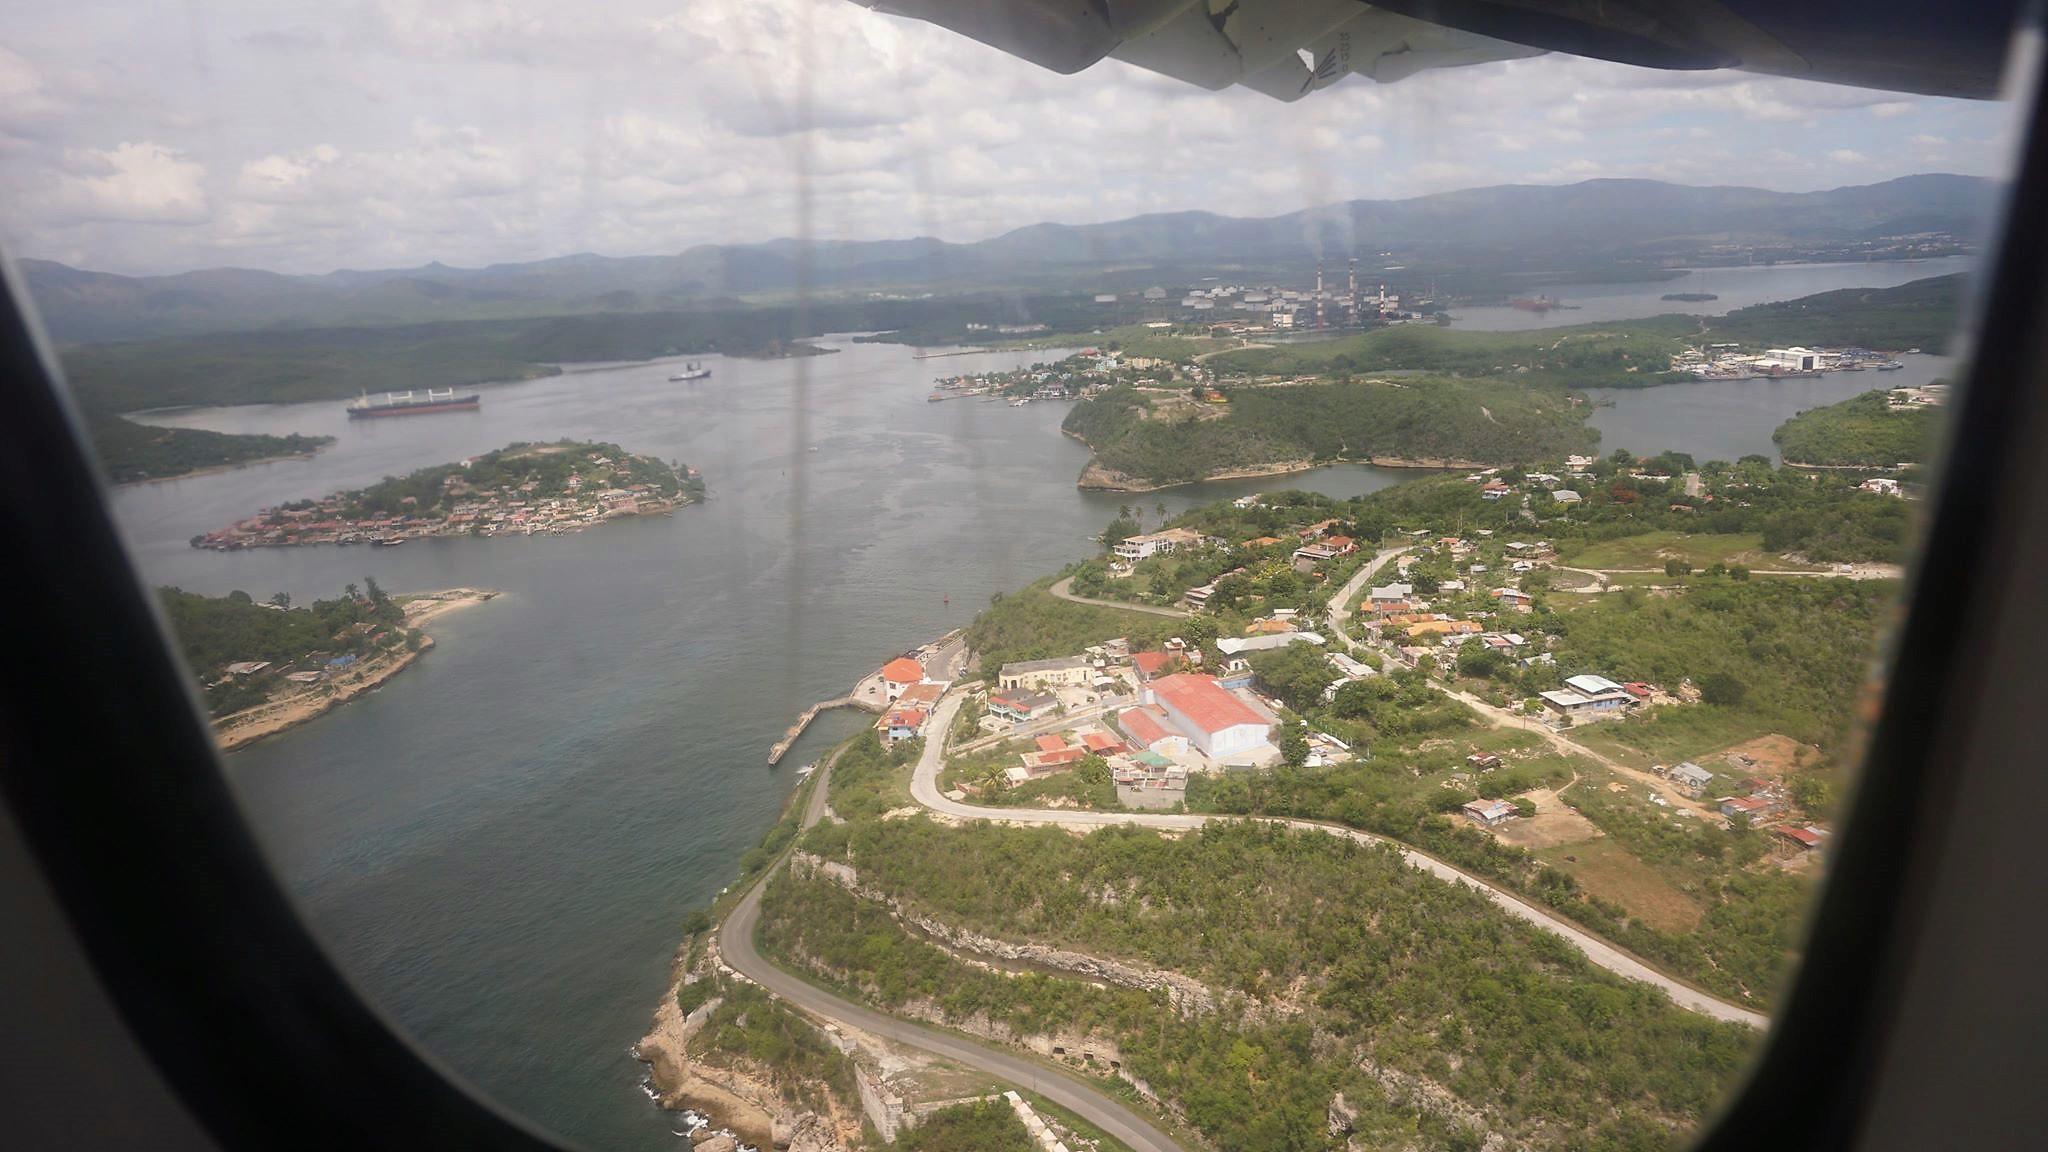 Kuba z lotu ptaka - Cayo Granma i Miramar